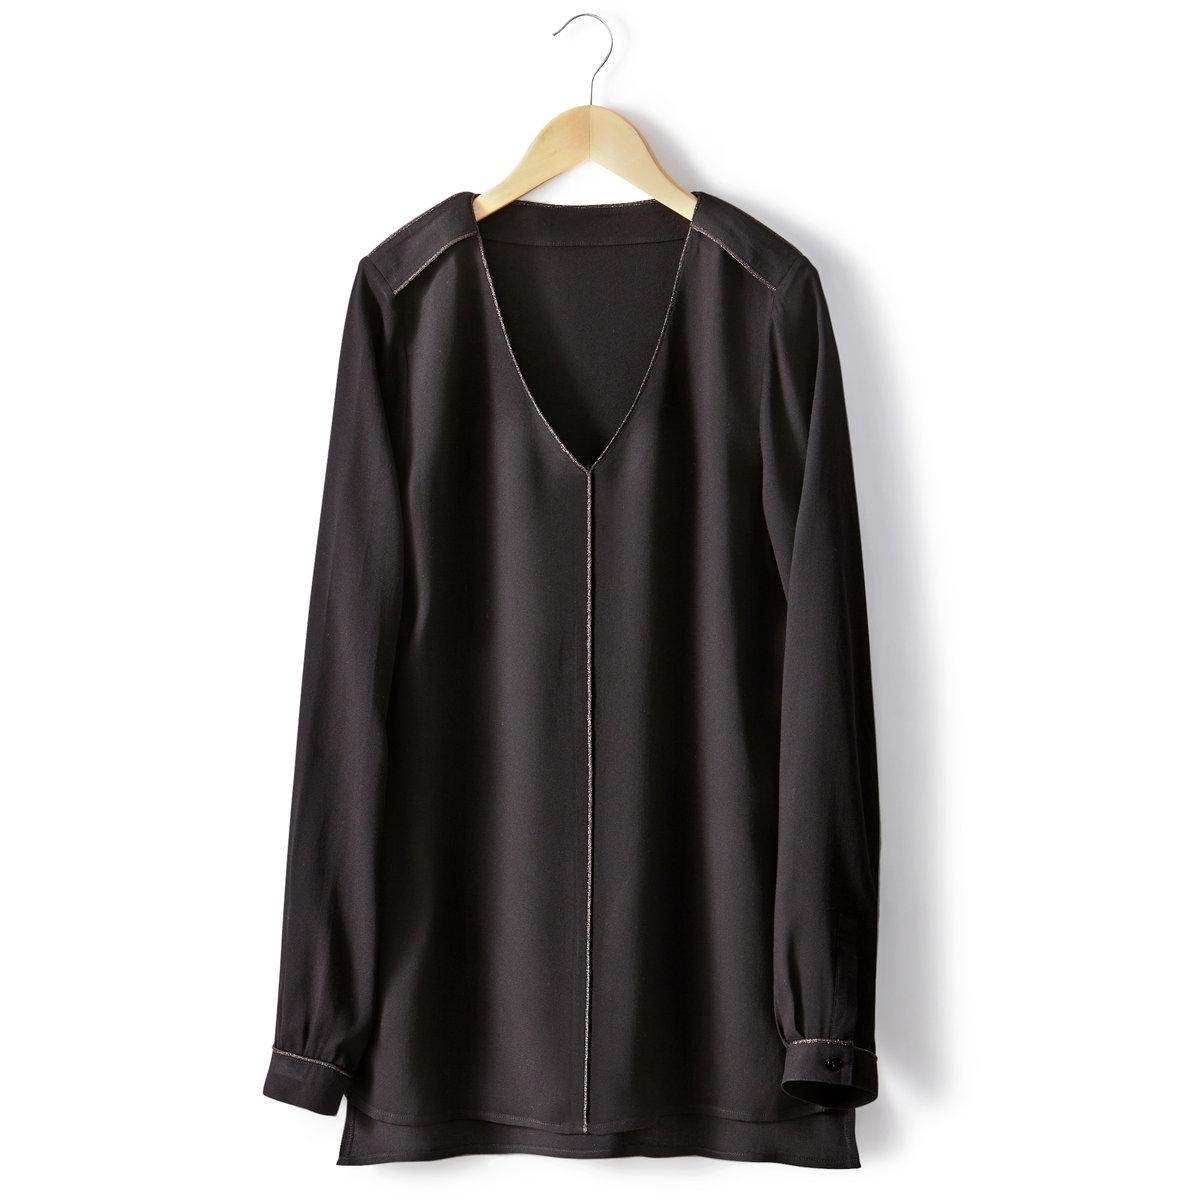 Блузка с V-образным вырезом<br><br>Цвет: черный<br>Размер: 34 (FR) - 40 (RUS).38 (FR) - 44 (RUS)